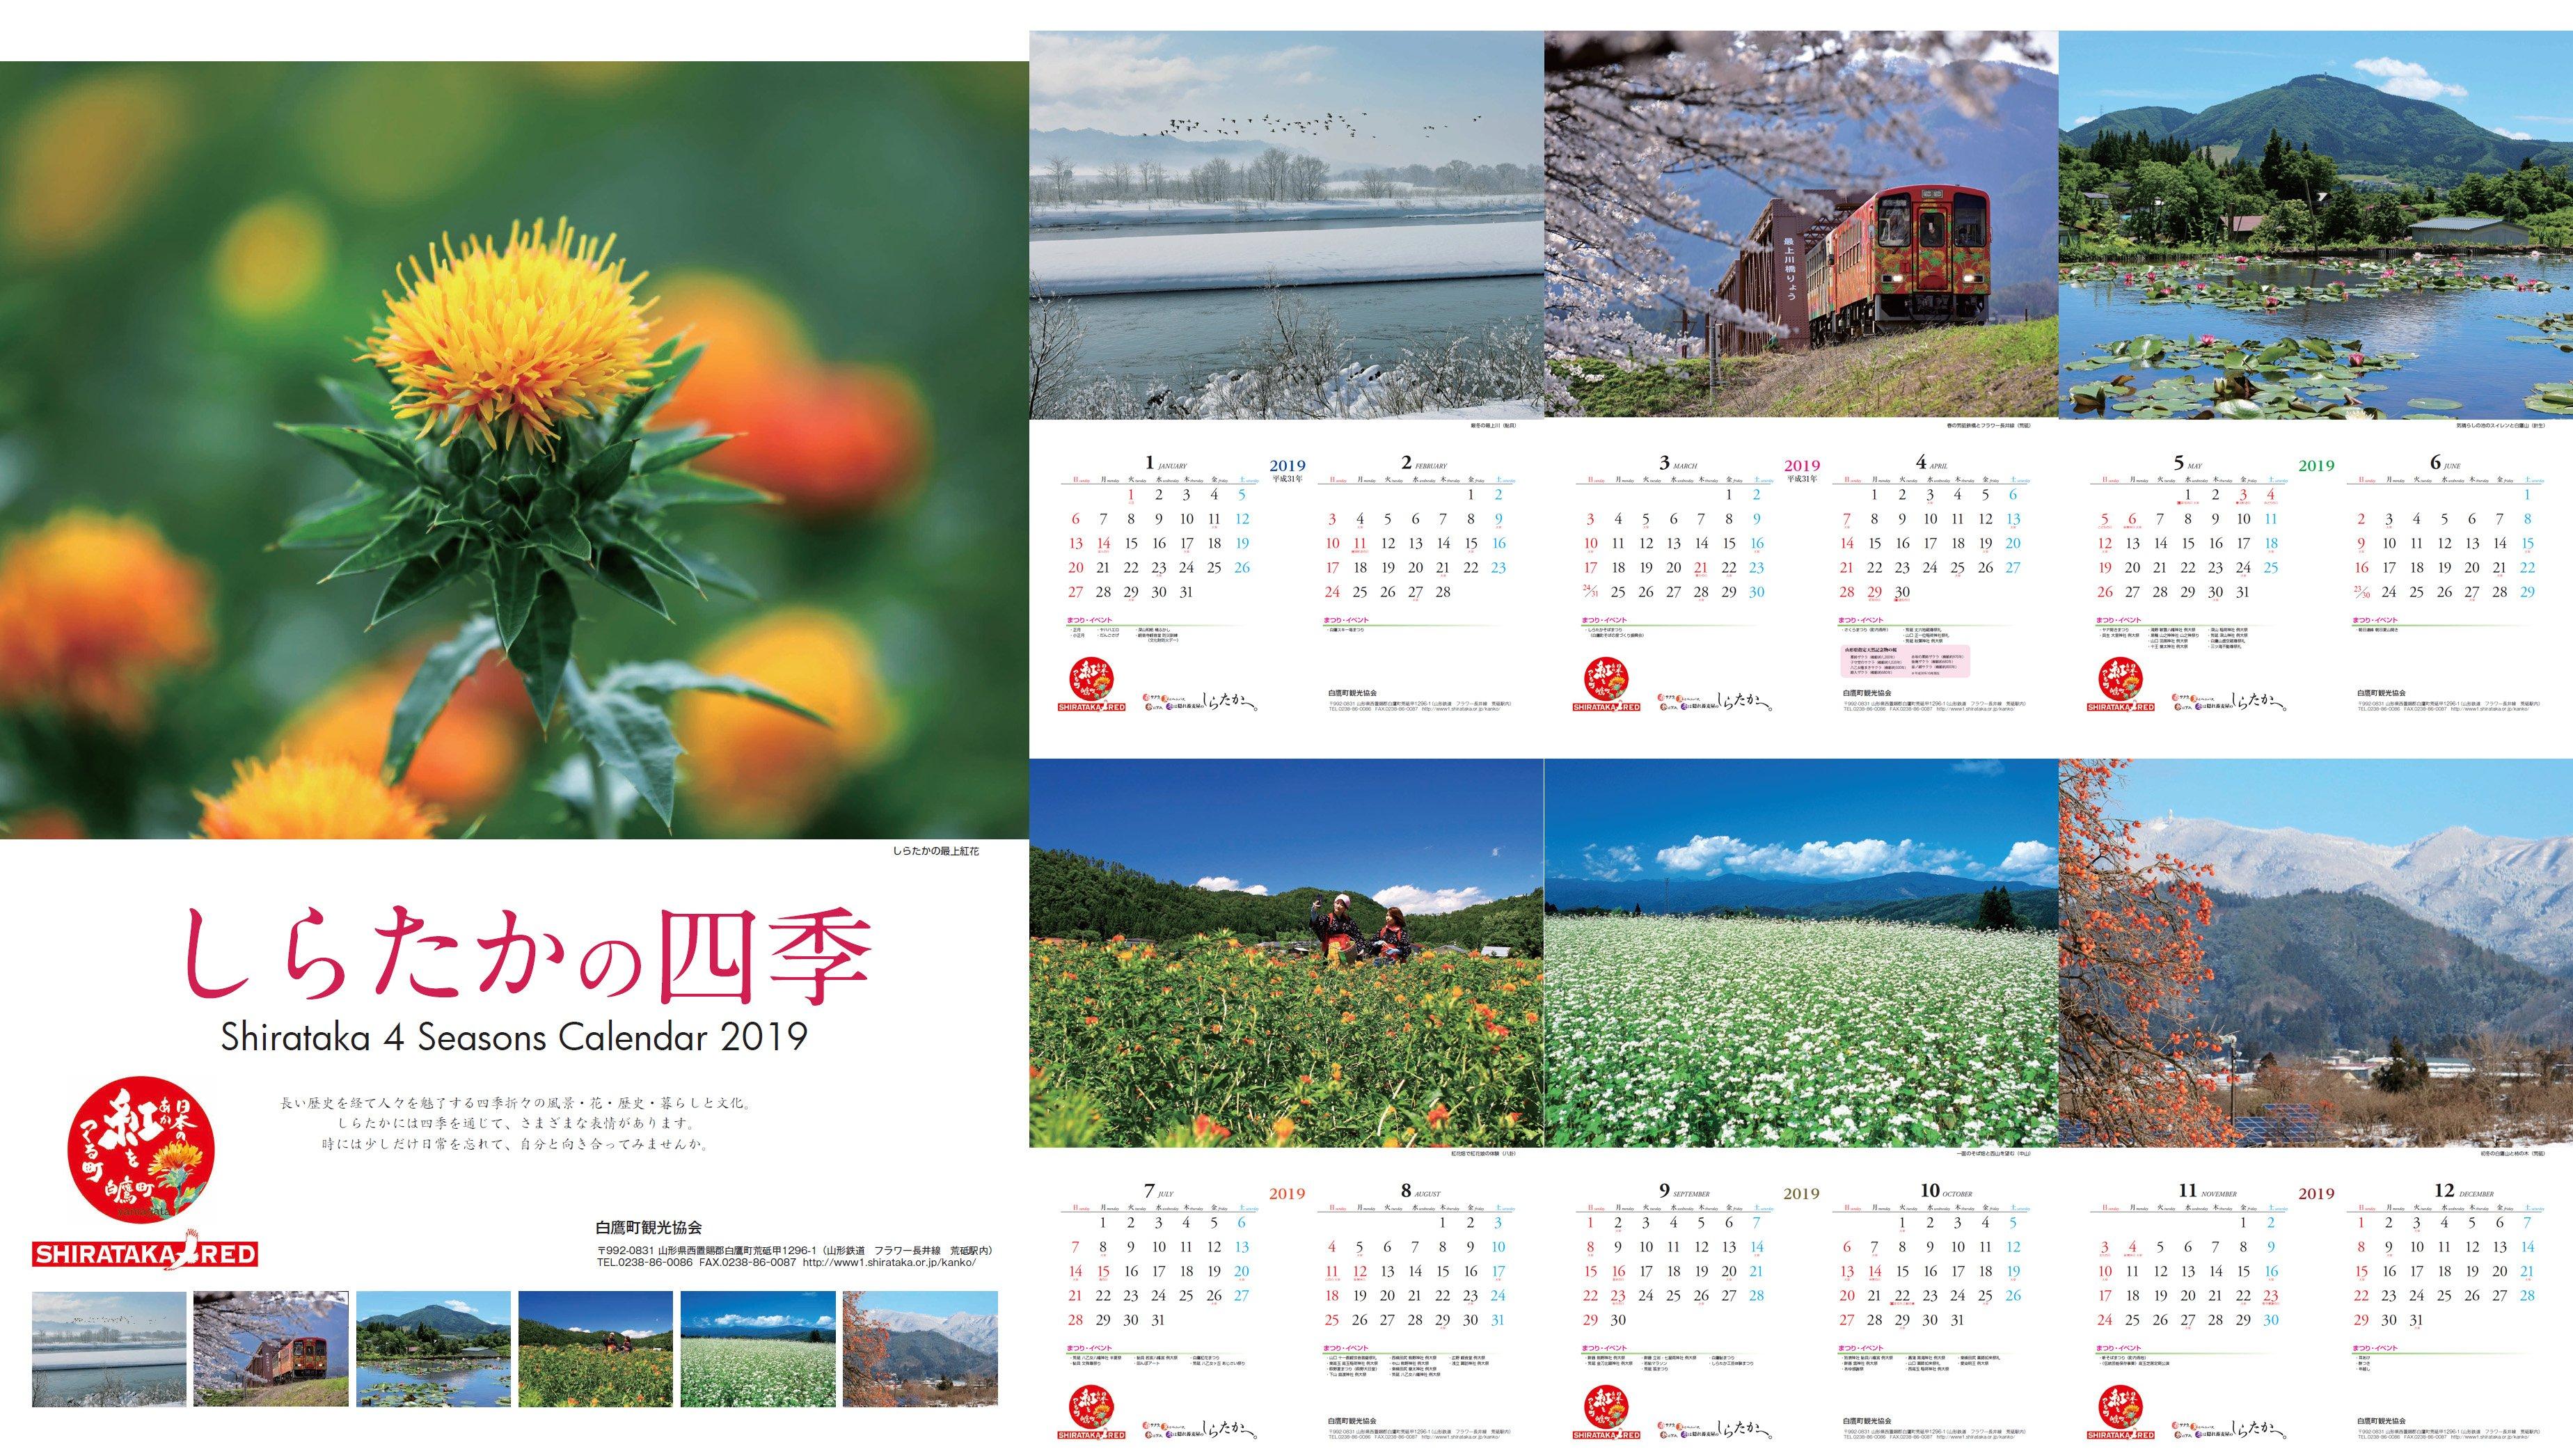 It Became Sold Out] News Of Shiratakano Four Seasons Calendar 2019 4 Seasons Calendar 2019